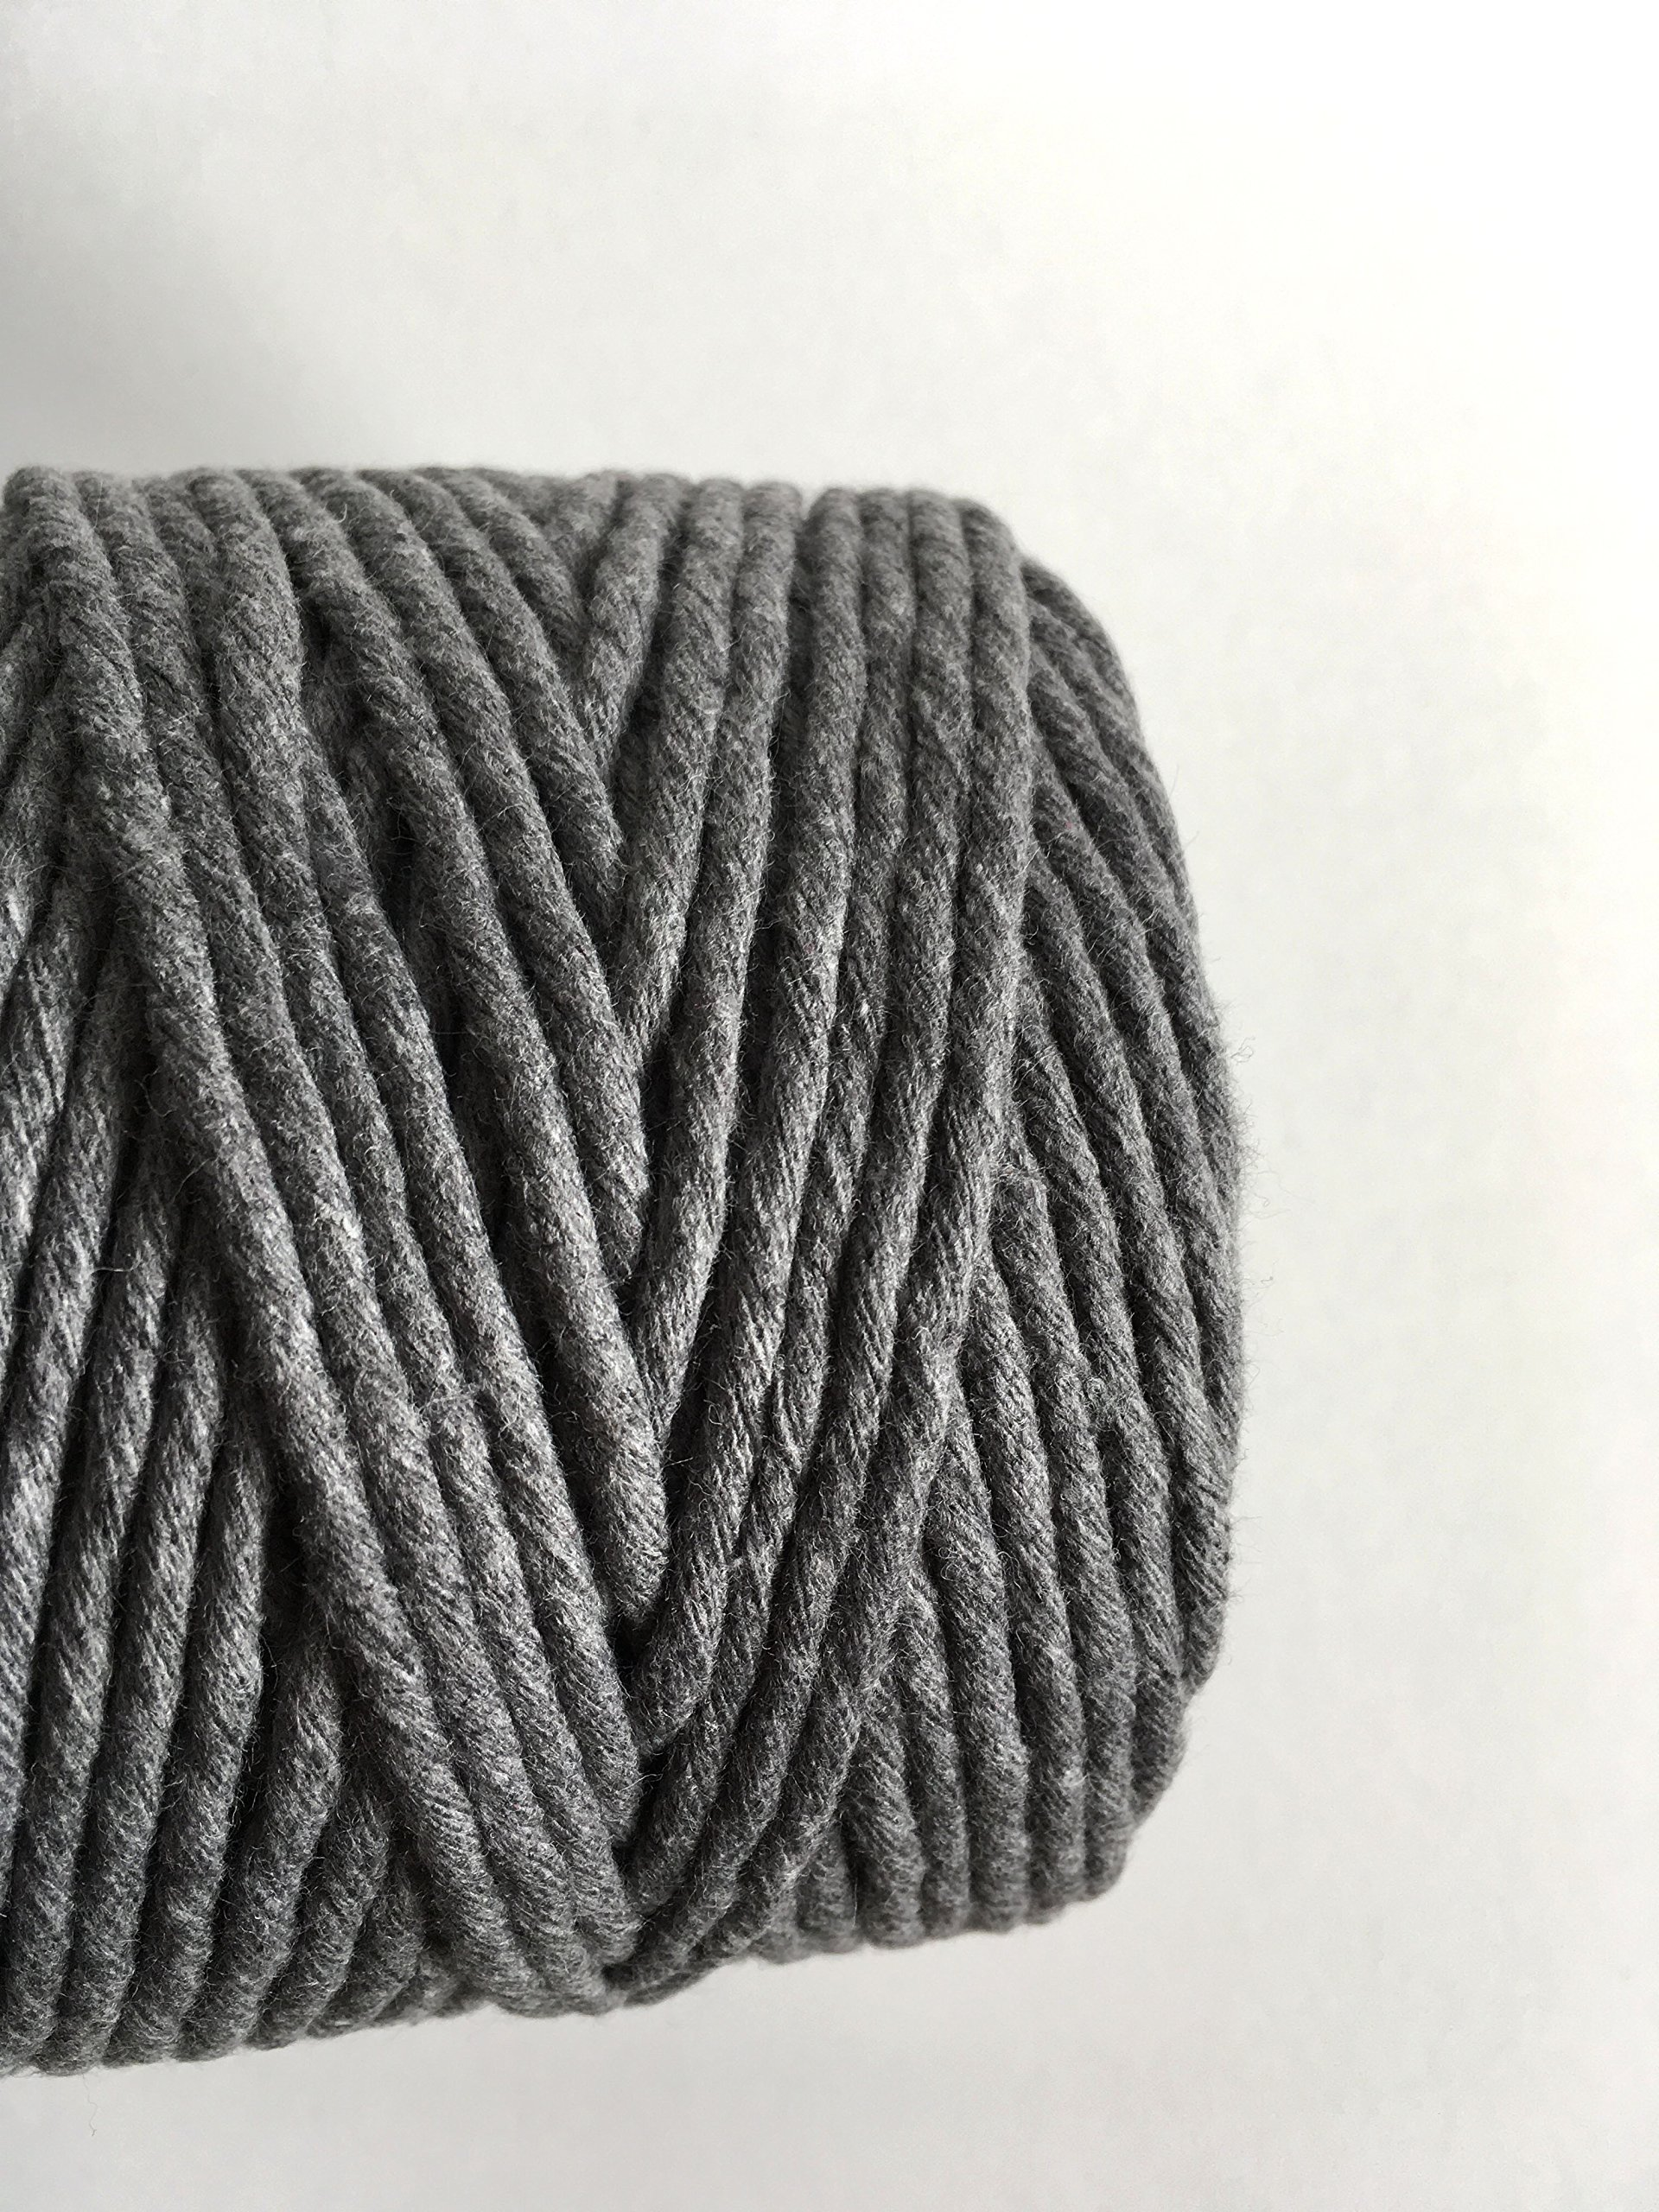 Gray Macrame Cord / 4mm Single Strand Cotton Fiber Art Rope/Earl Gray/Charcoal by Rock Mountain Co (Image #4)